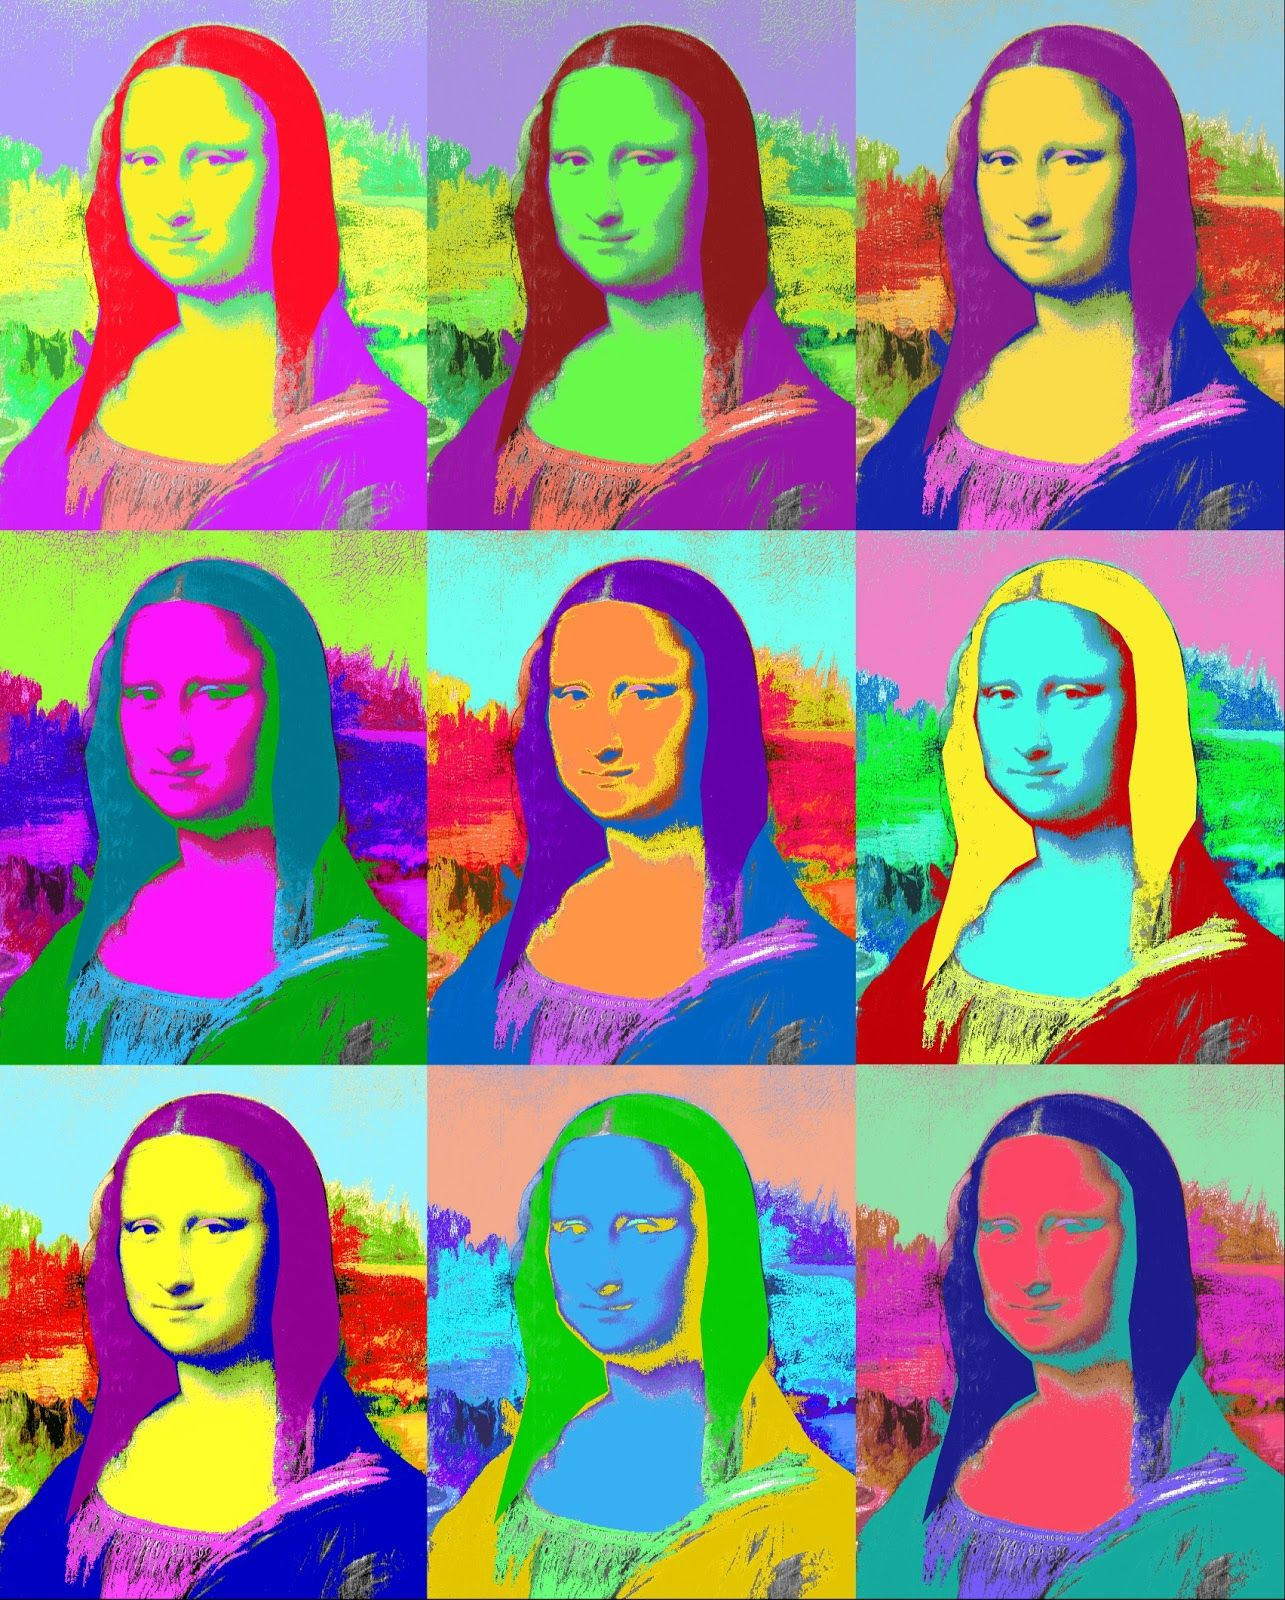 Fabuleux Mona Lisa en artpop.   Art Nouveau, Decó, Pop & Modernismo.   Andy @CU_83